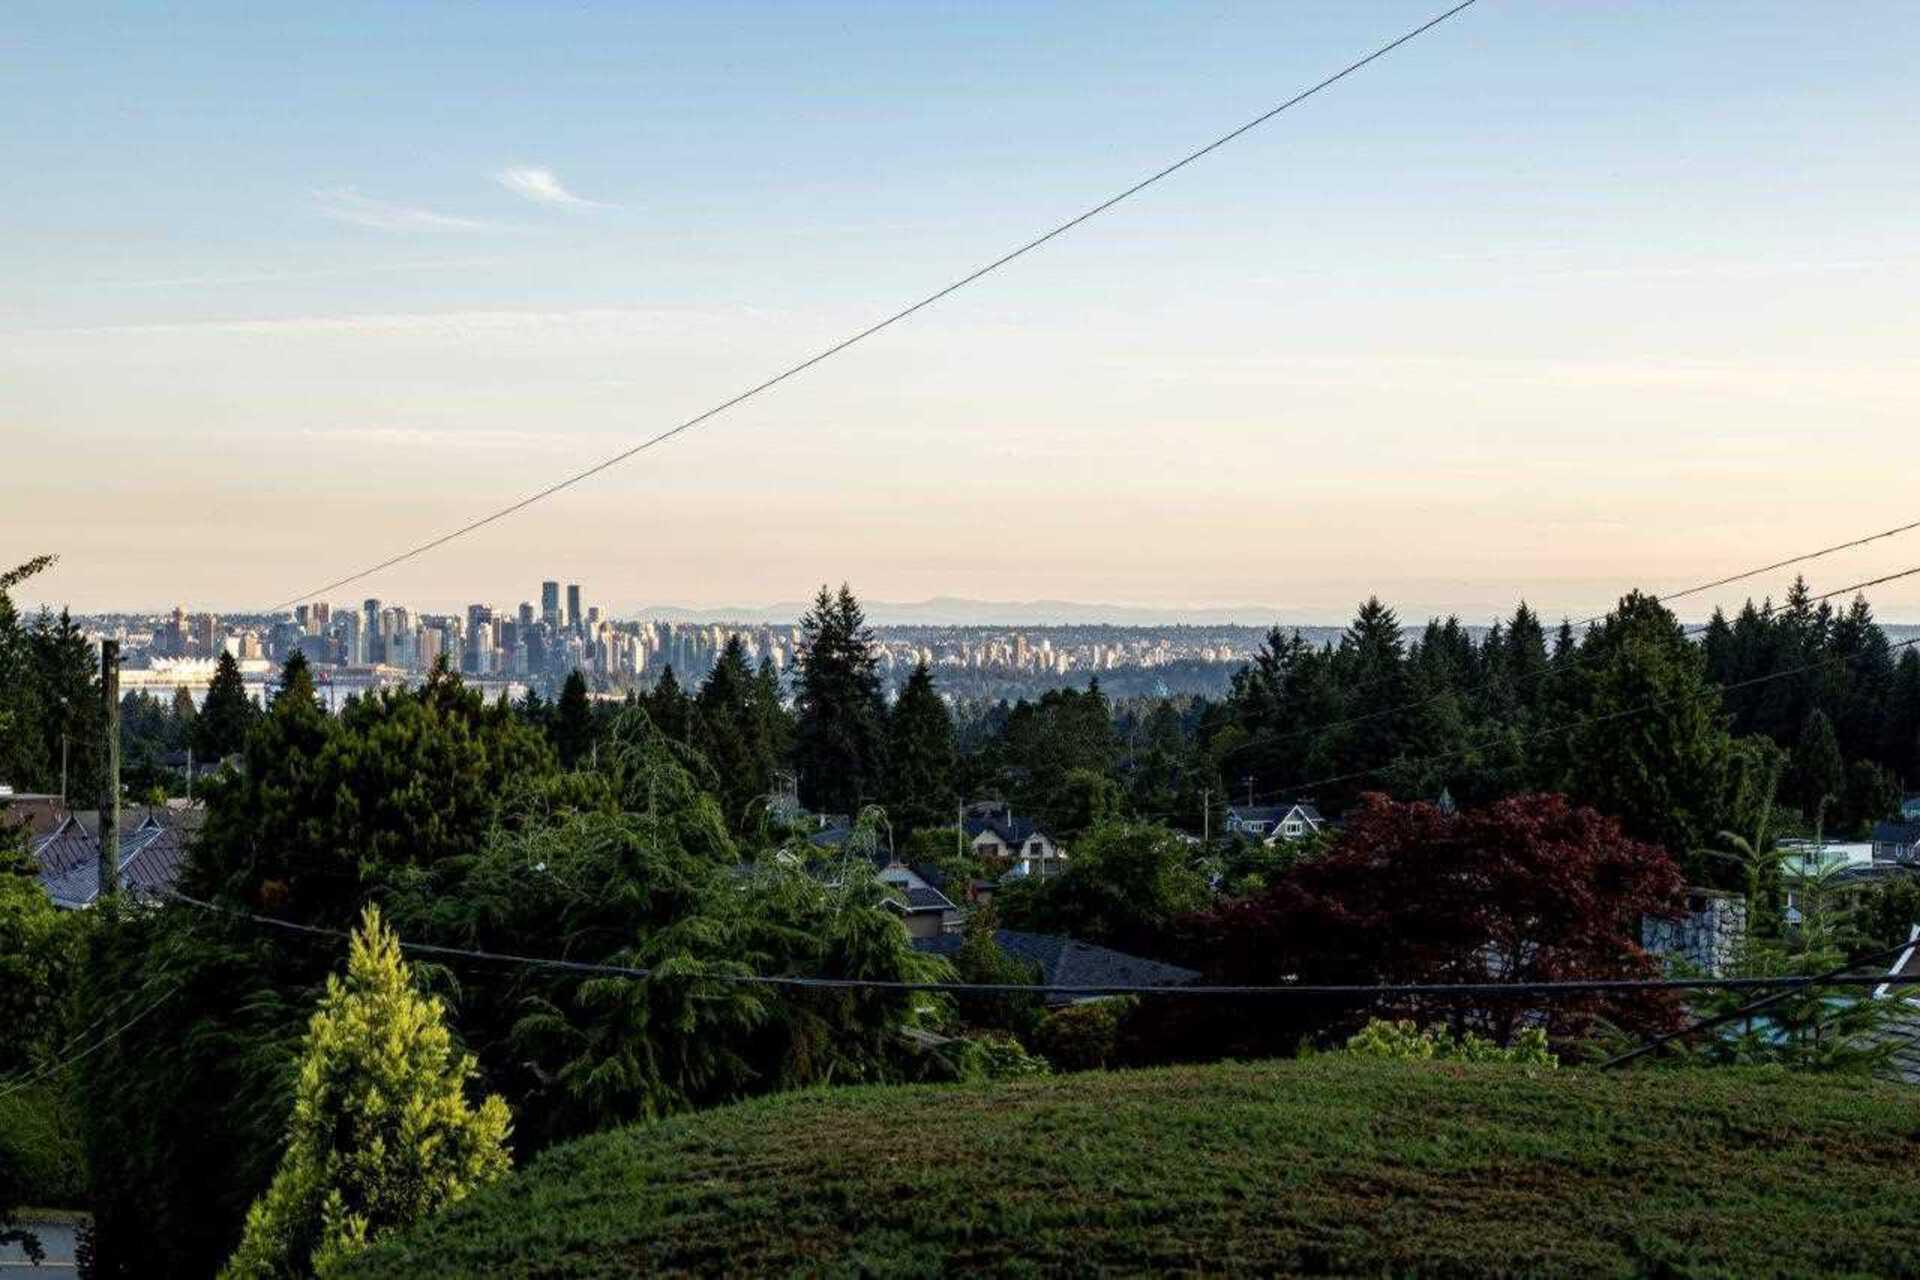 4367-ranger-avenue-forest-hills-nv-north-vancouver-29 at 4367 Ranger Avenue, Forest Hills NV, North Vancouver